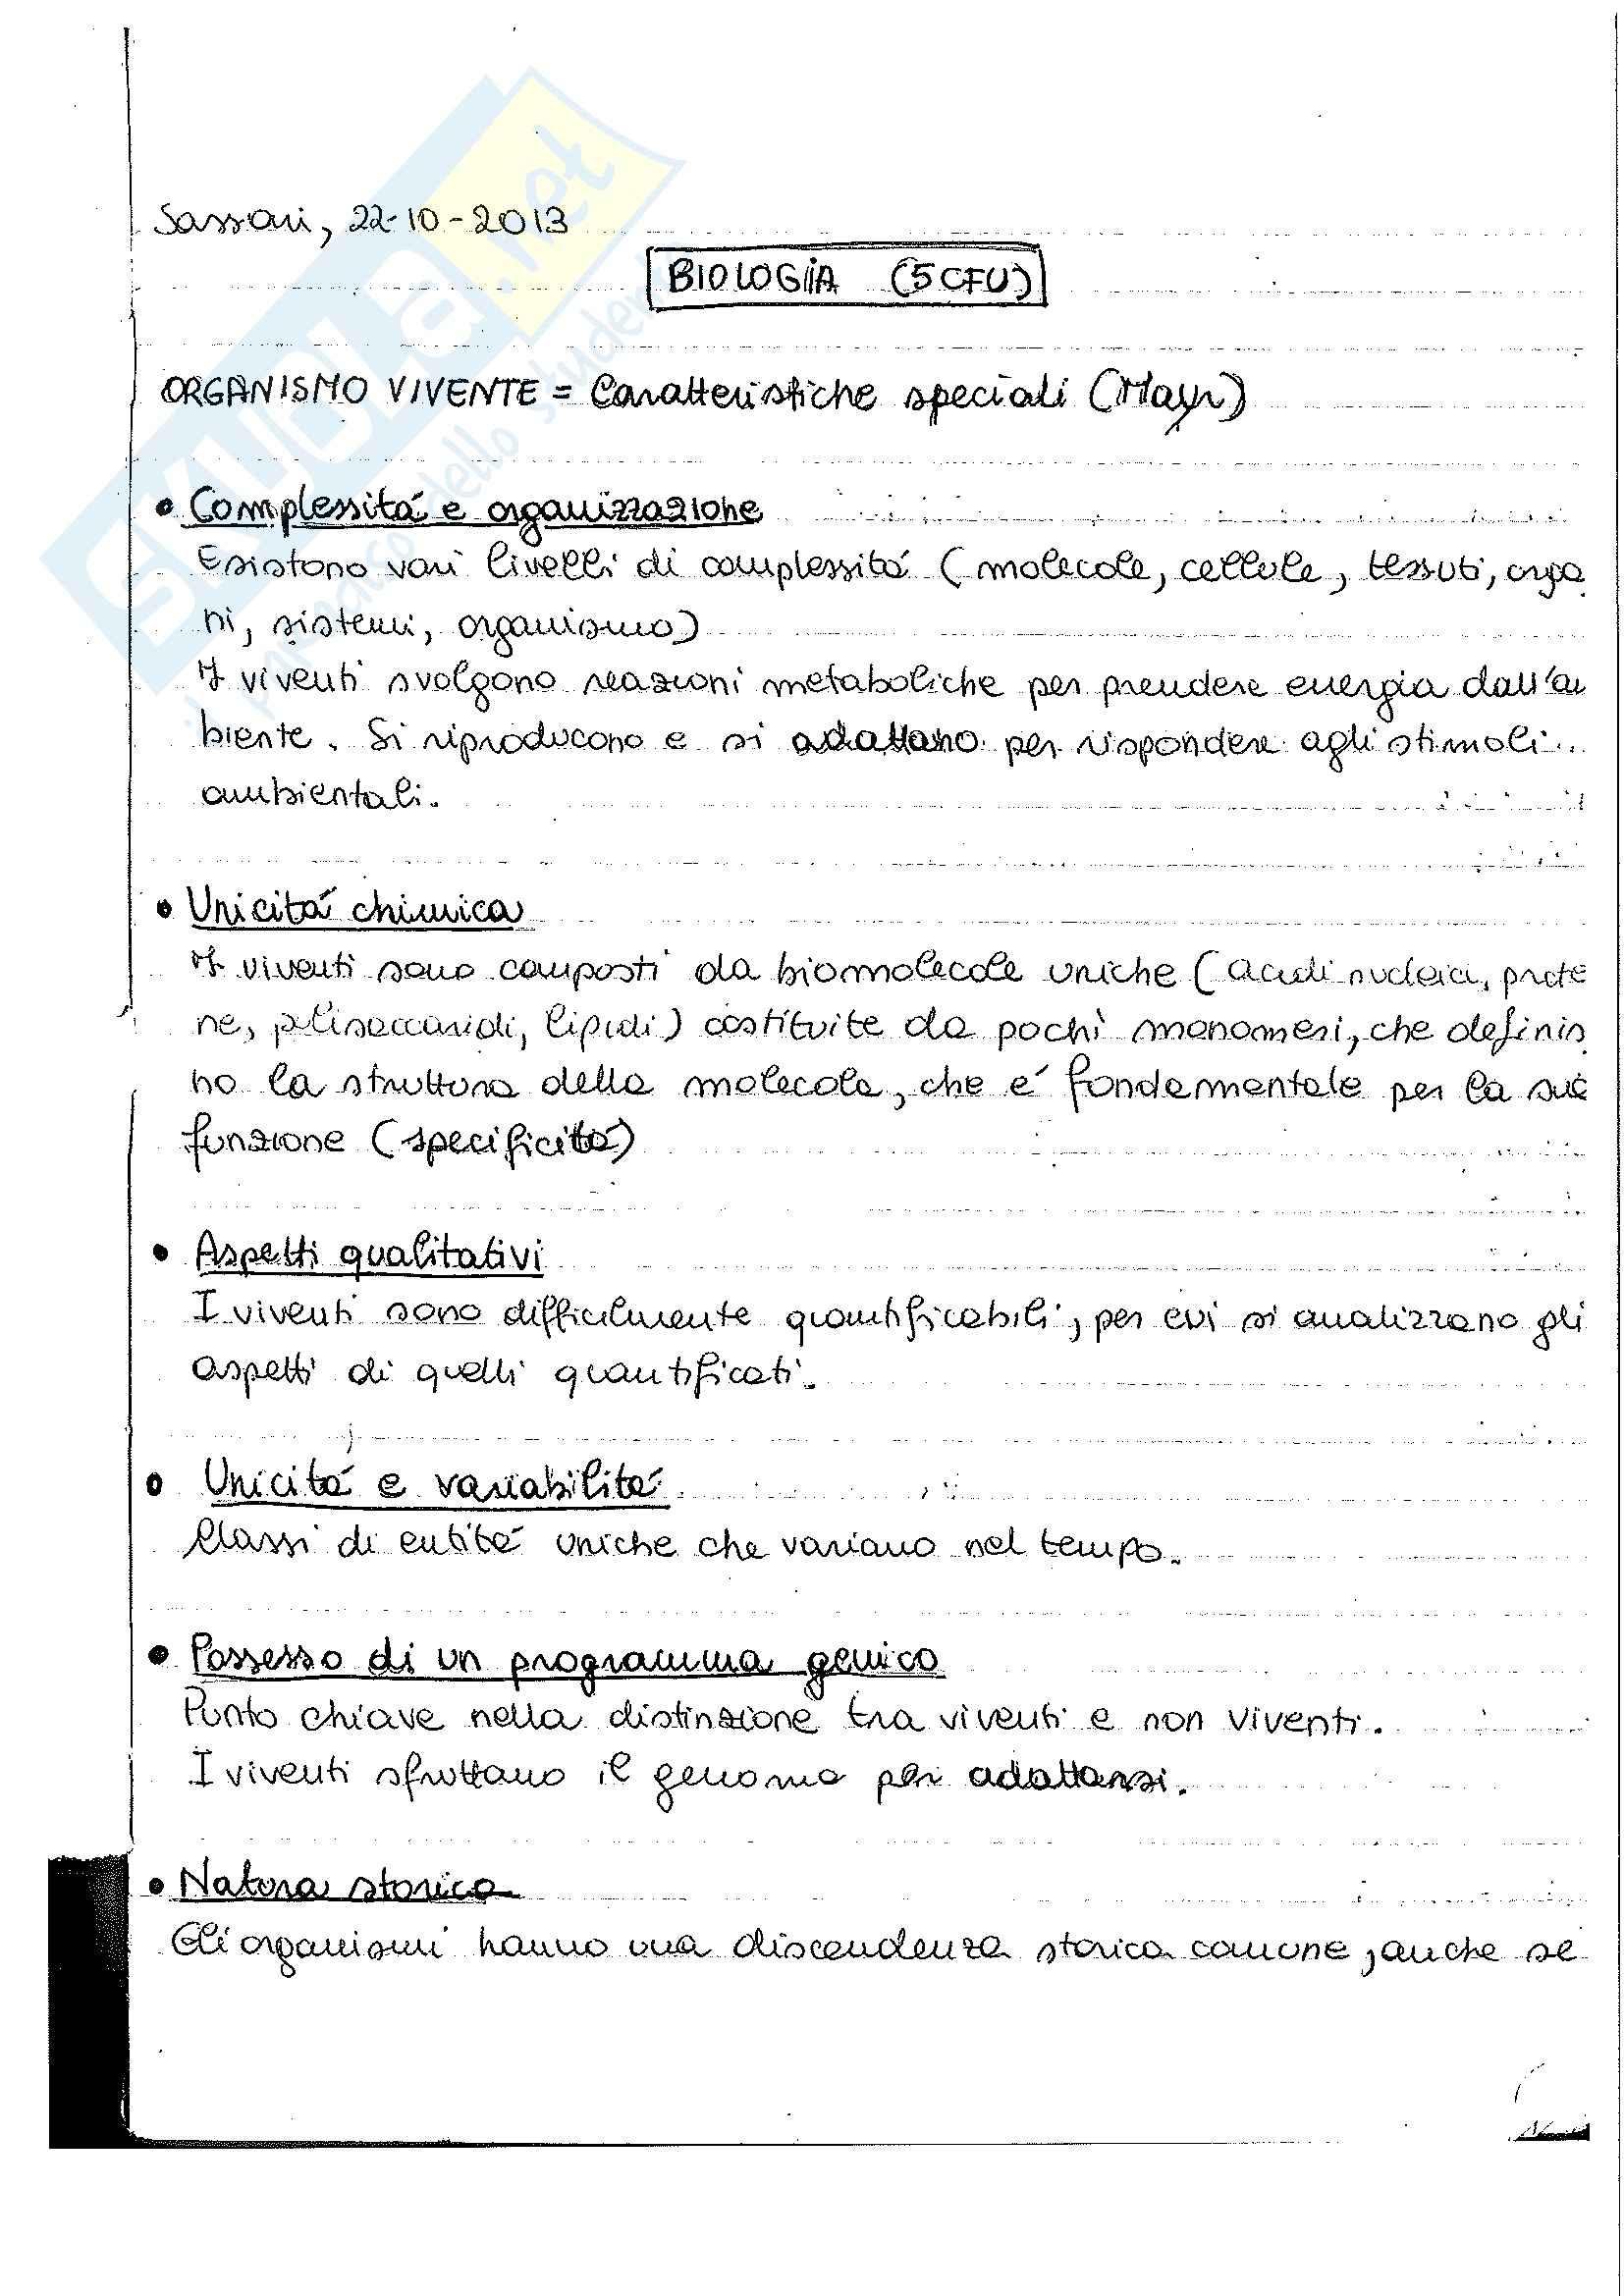 Biologia - Appunti lezioni